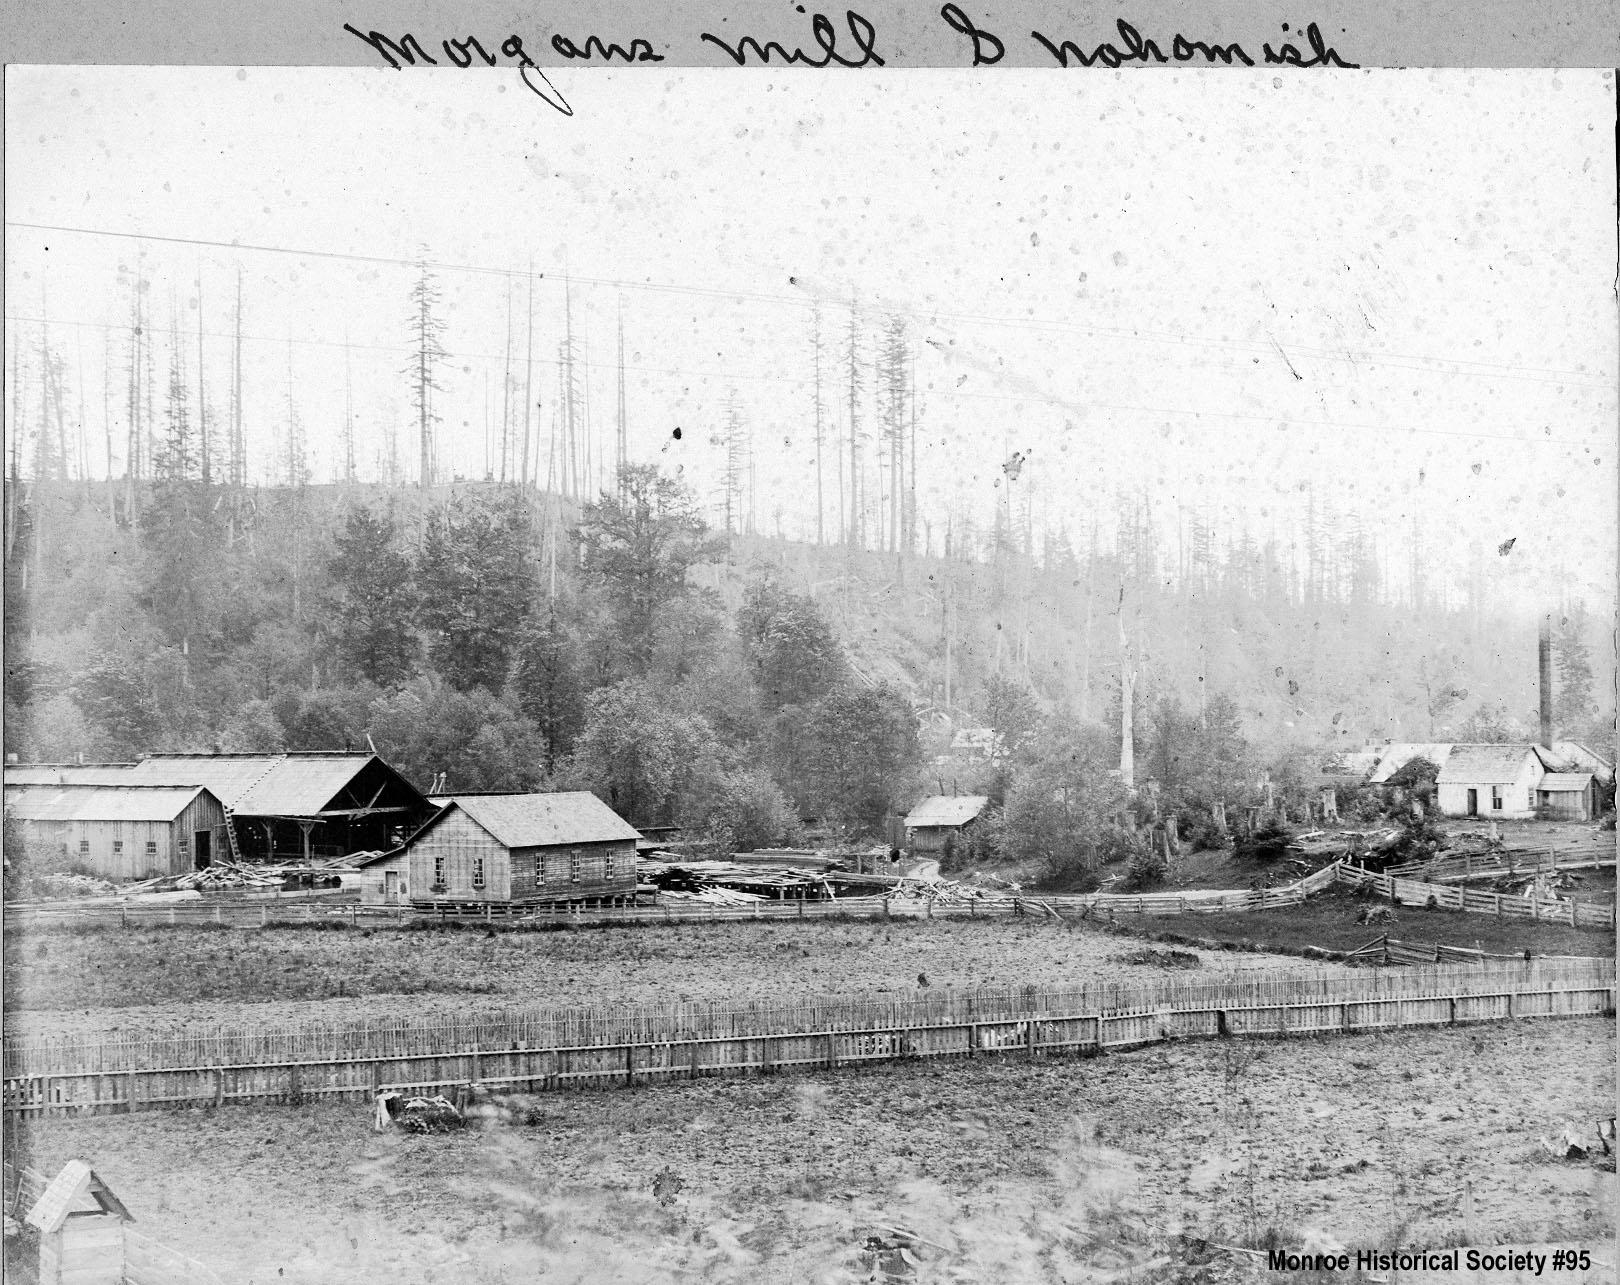 0095 Morgan's Water Power Mill, Snohomish c1879